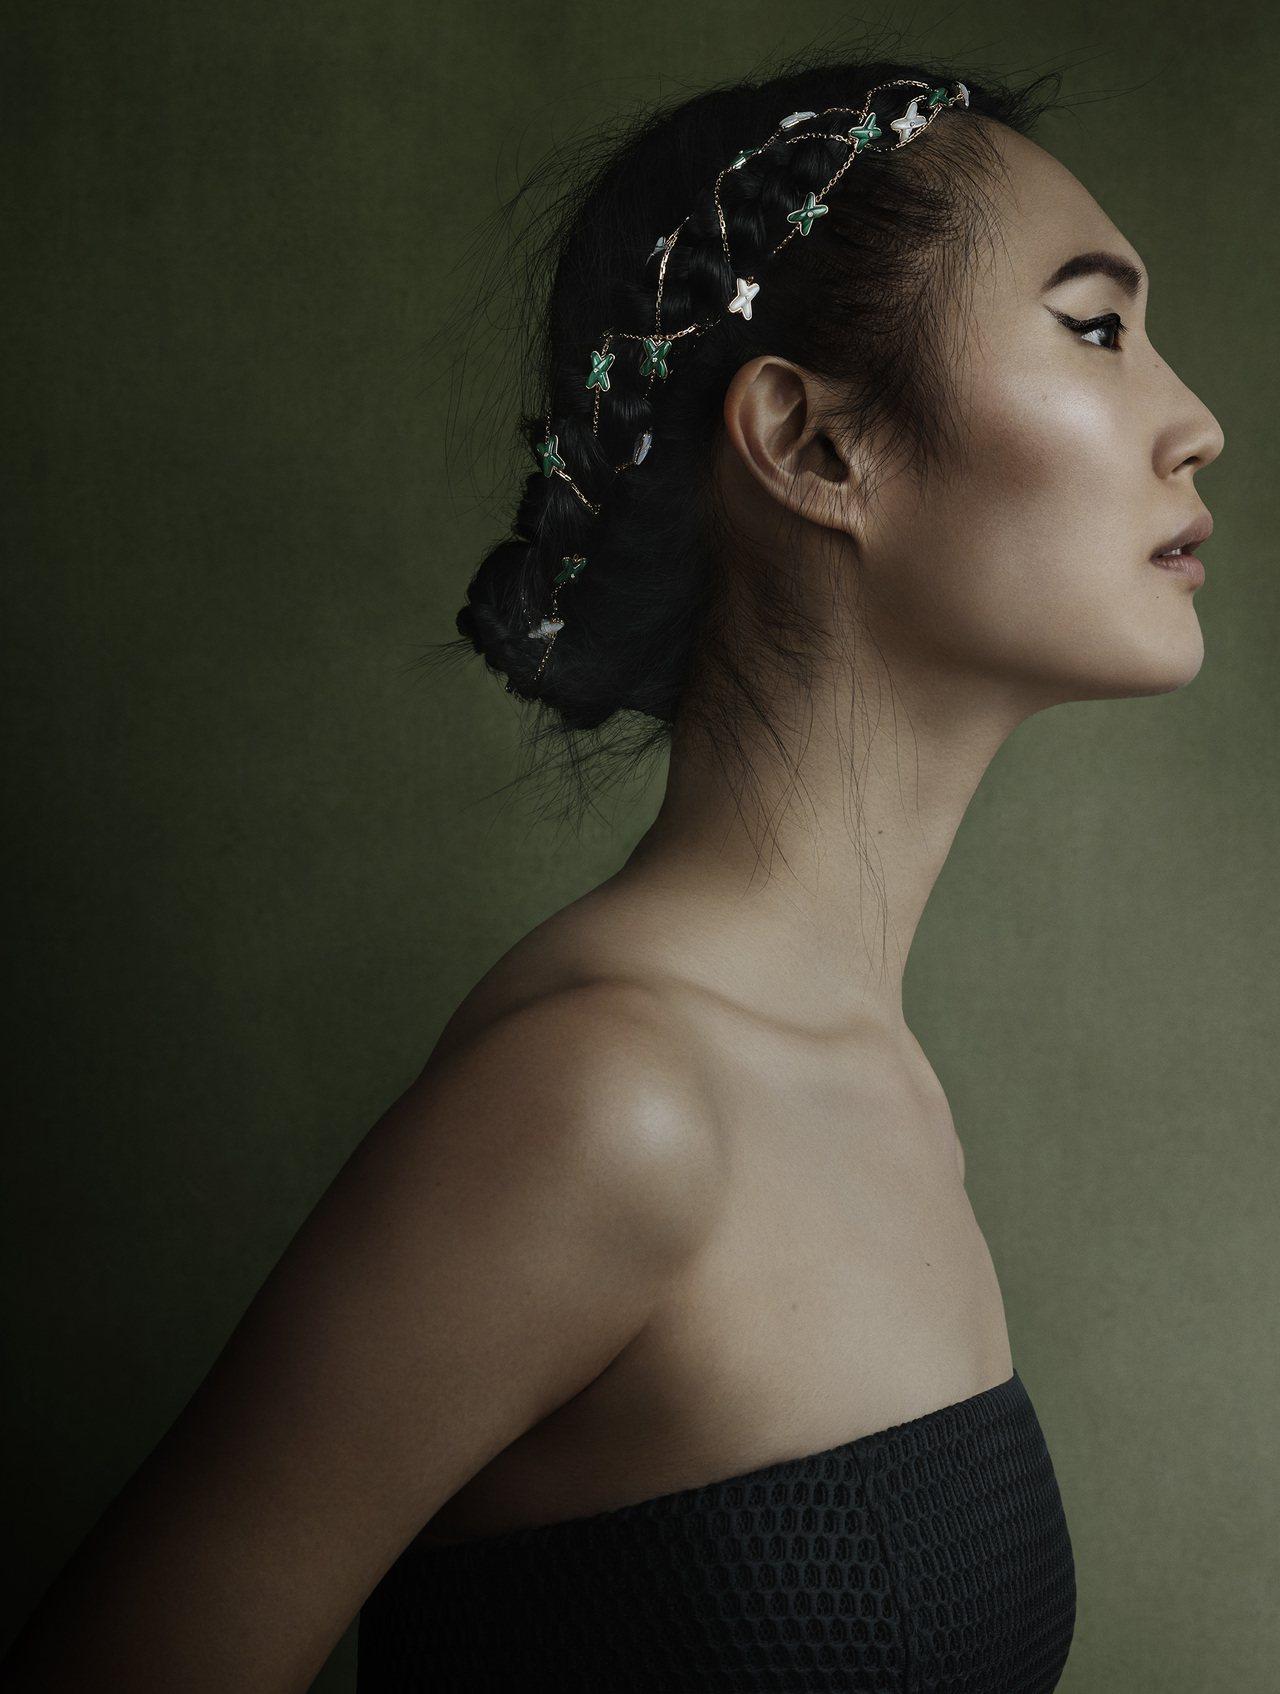 Jeux de Liens長項鍊也能變成髮飾來配戴,反轉了高級珠寶的可應用性。圖...